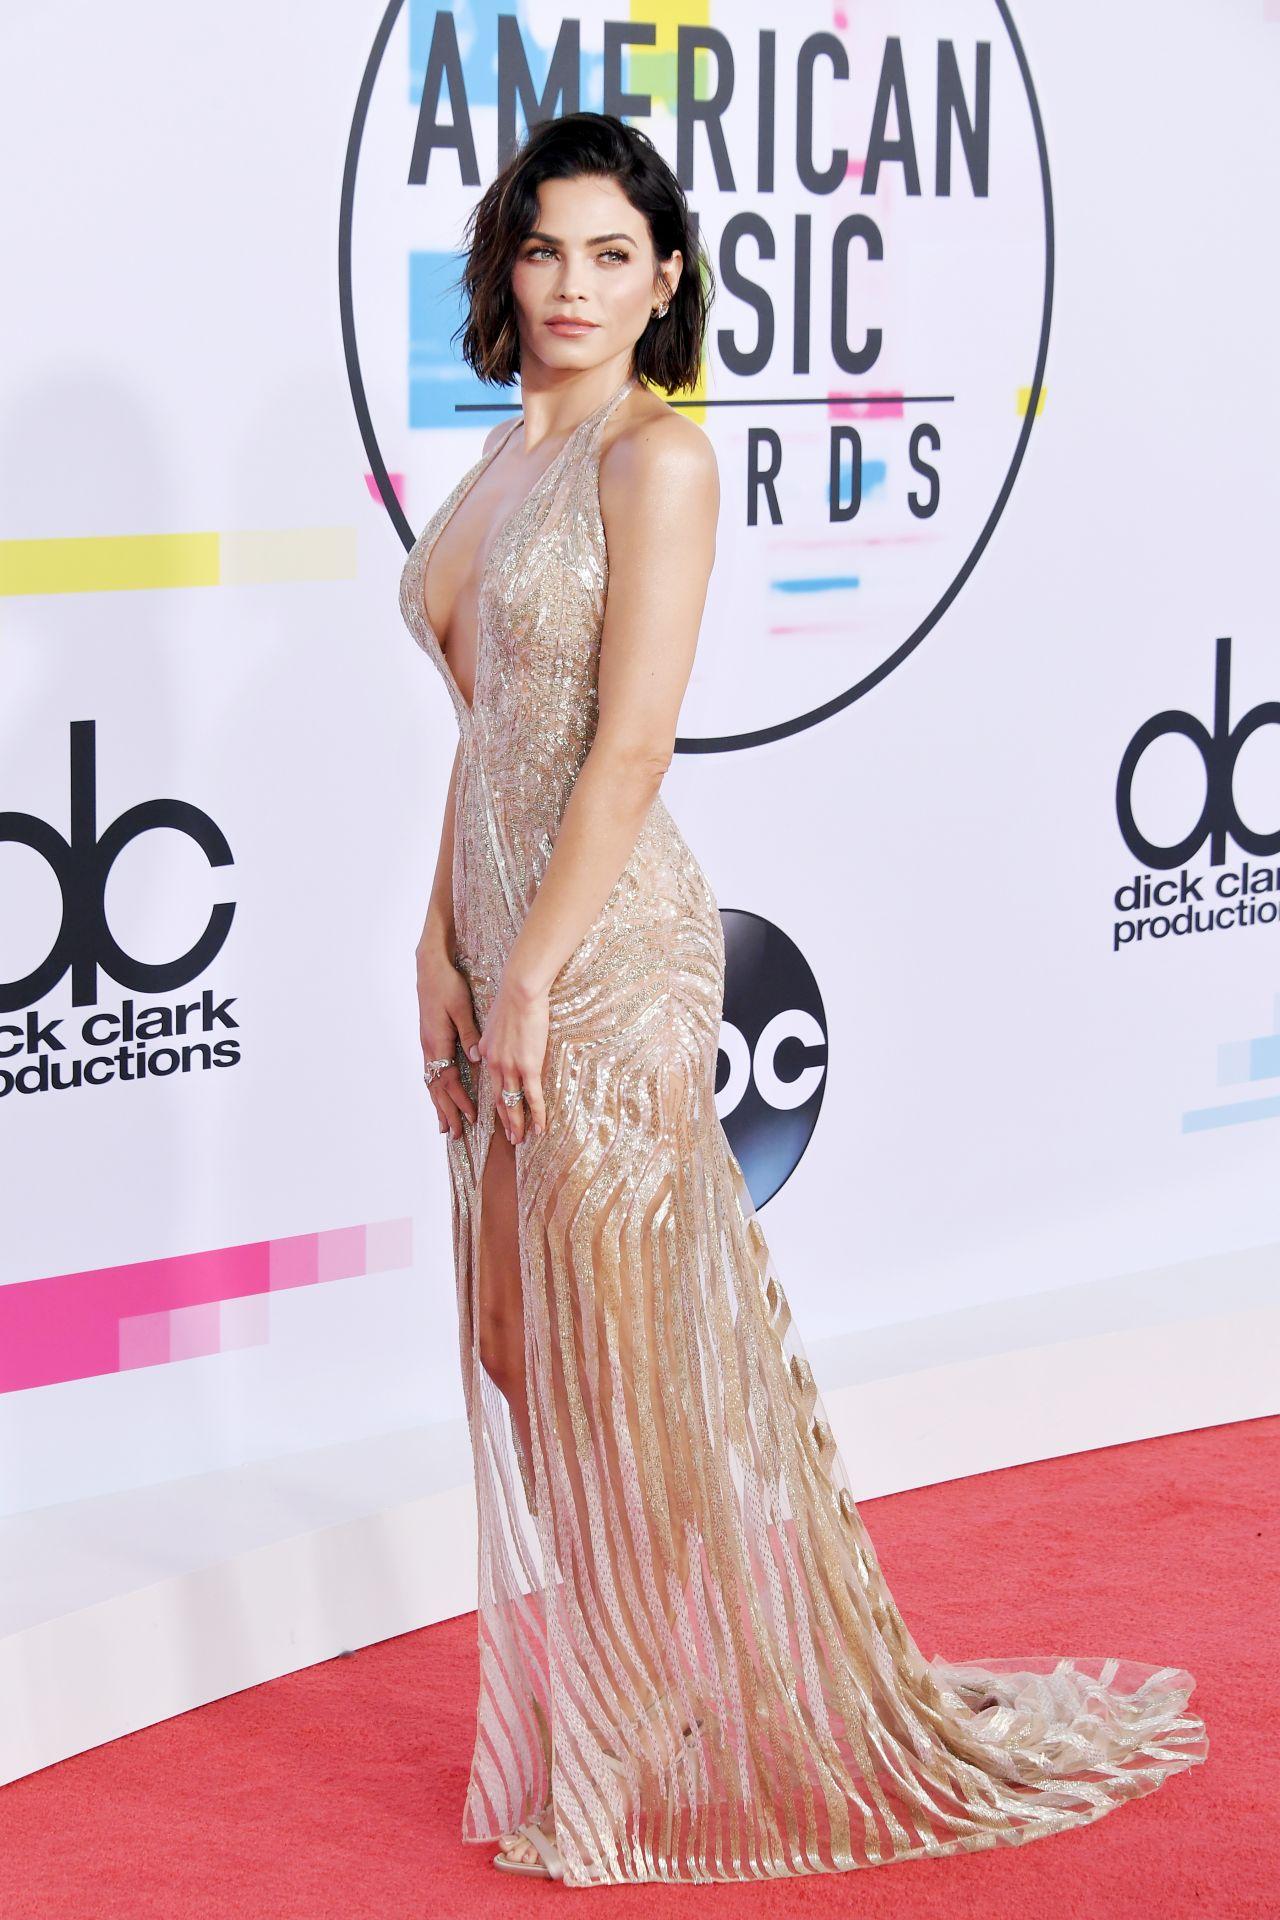 Jenna Dewan Tatum – American Music Awards 2017 in Los Angeles